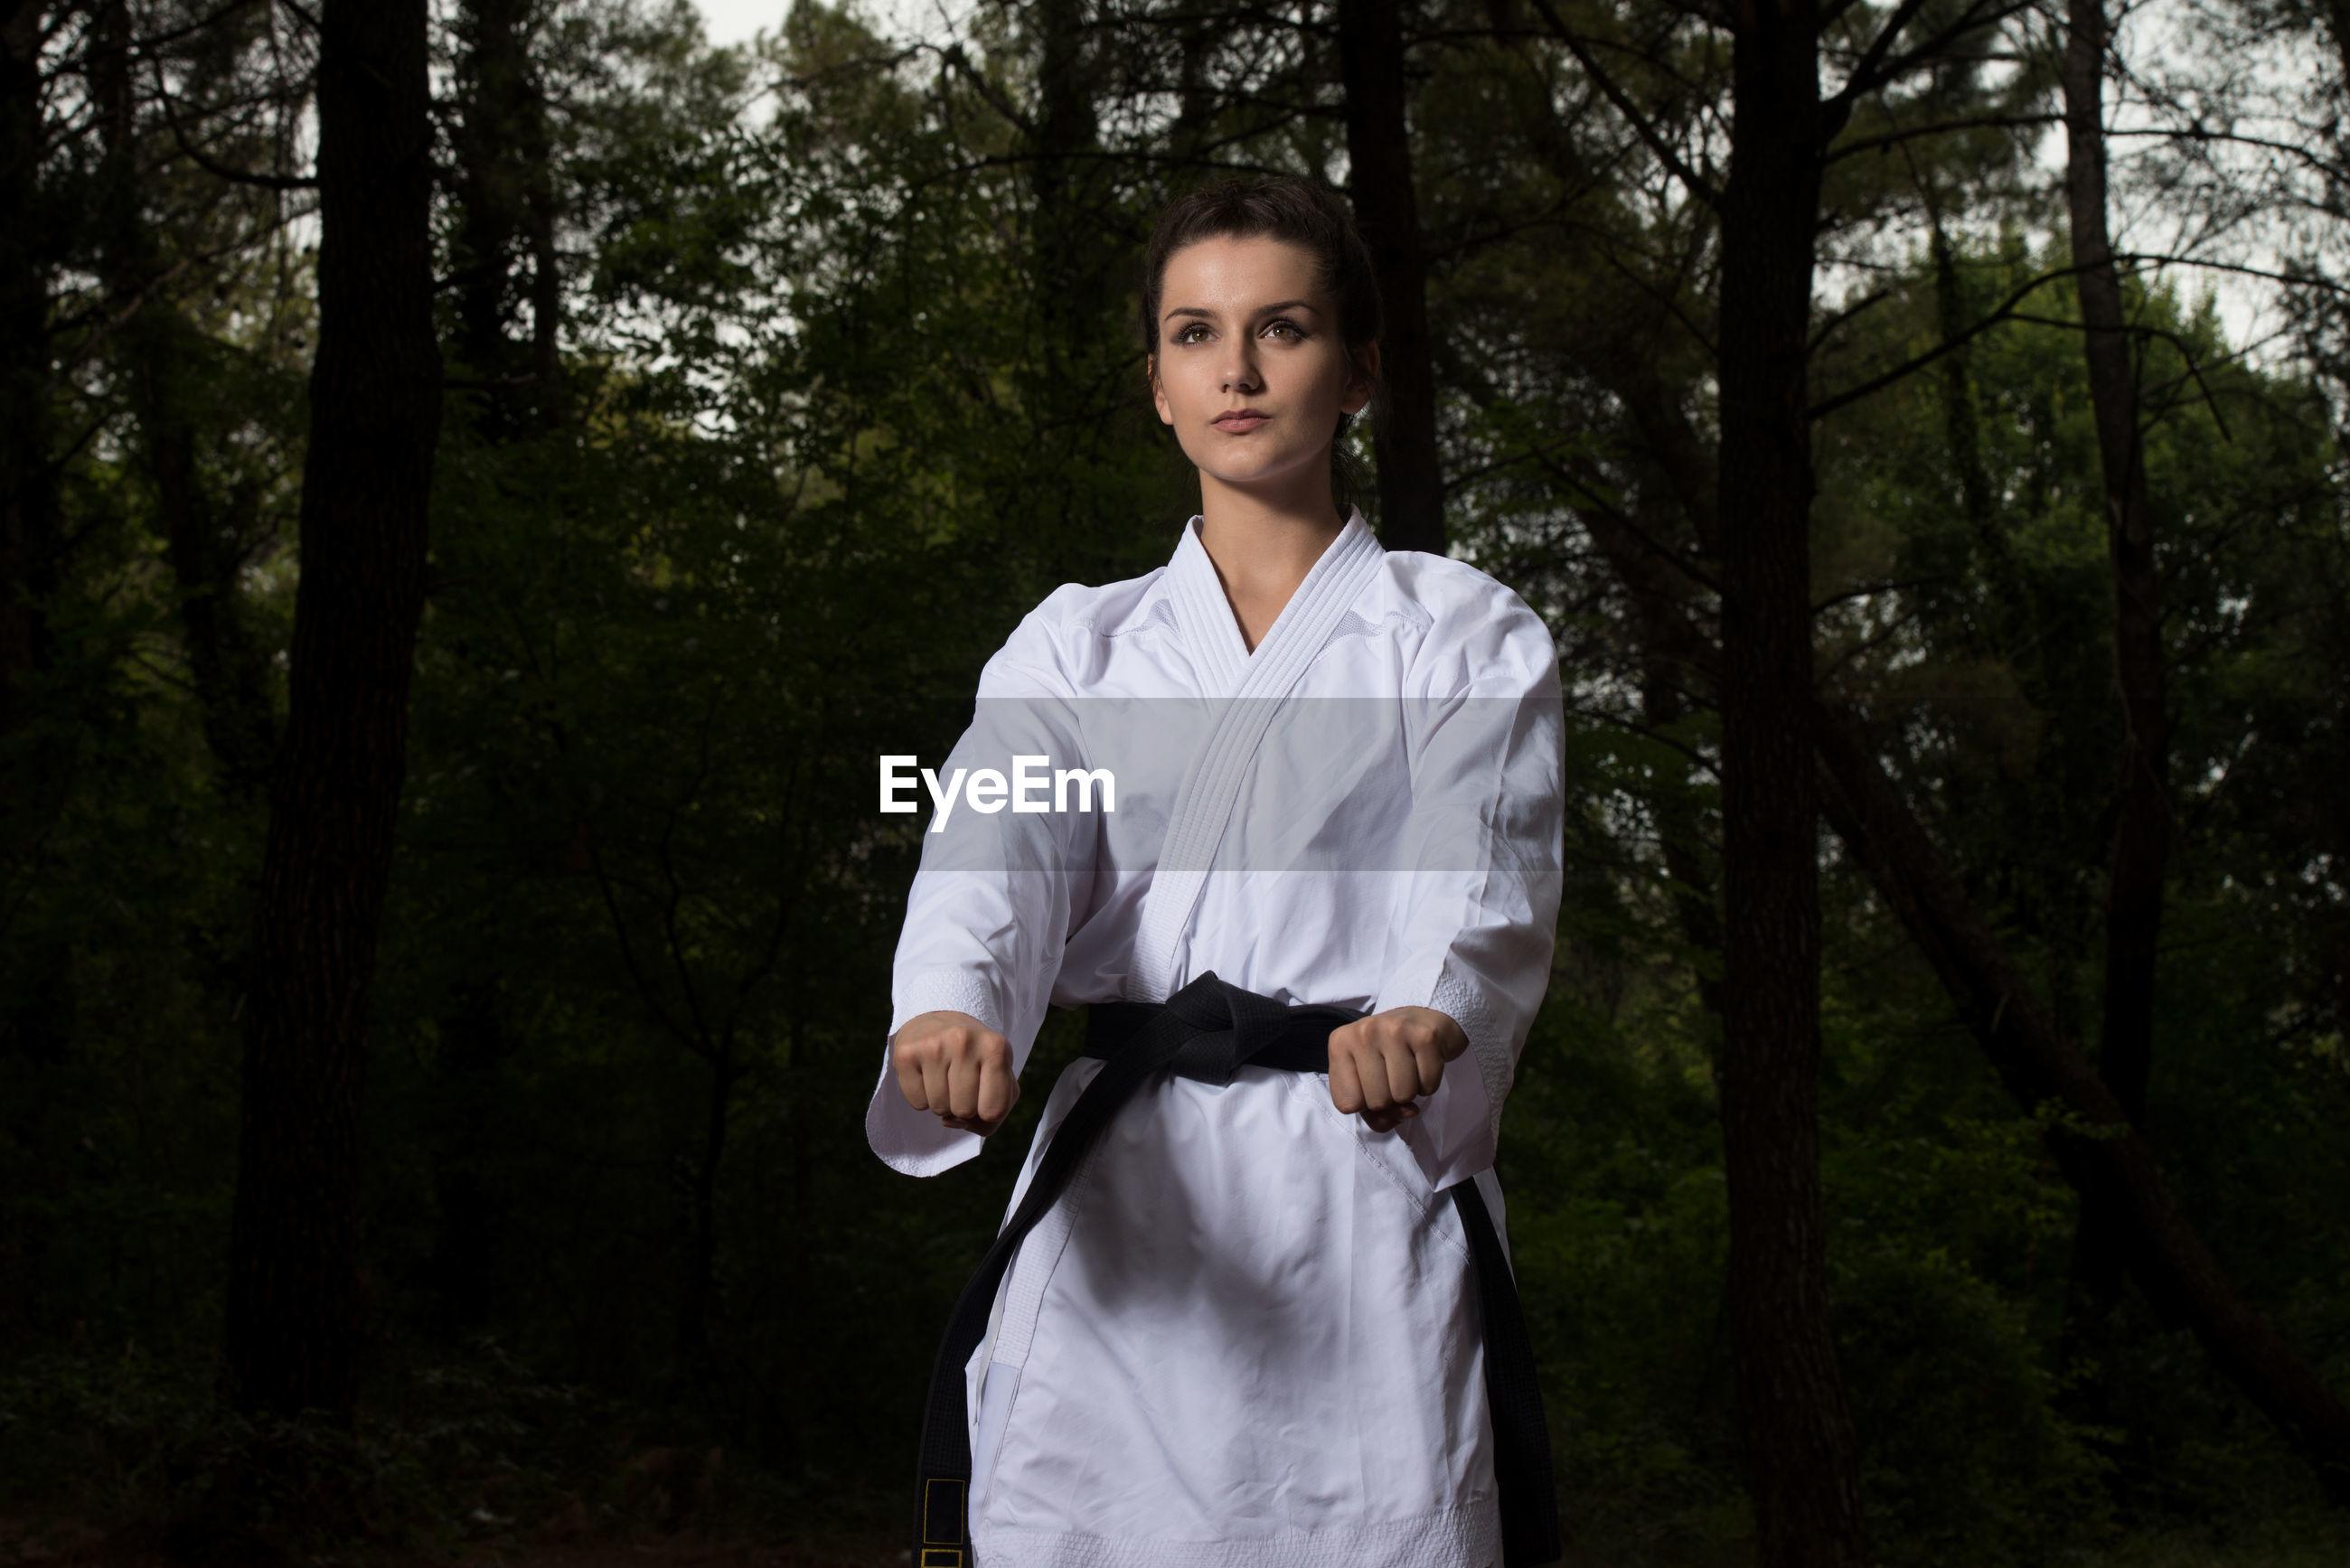 Karate woman standing against trees